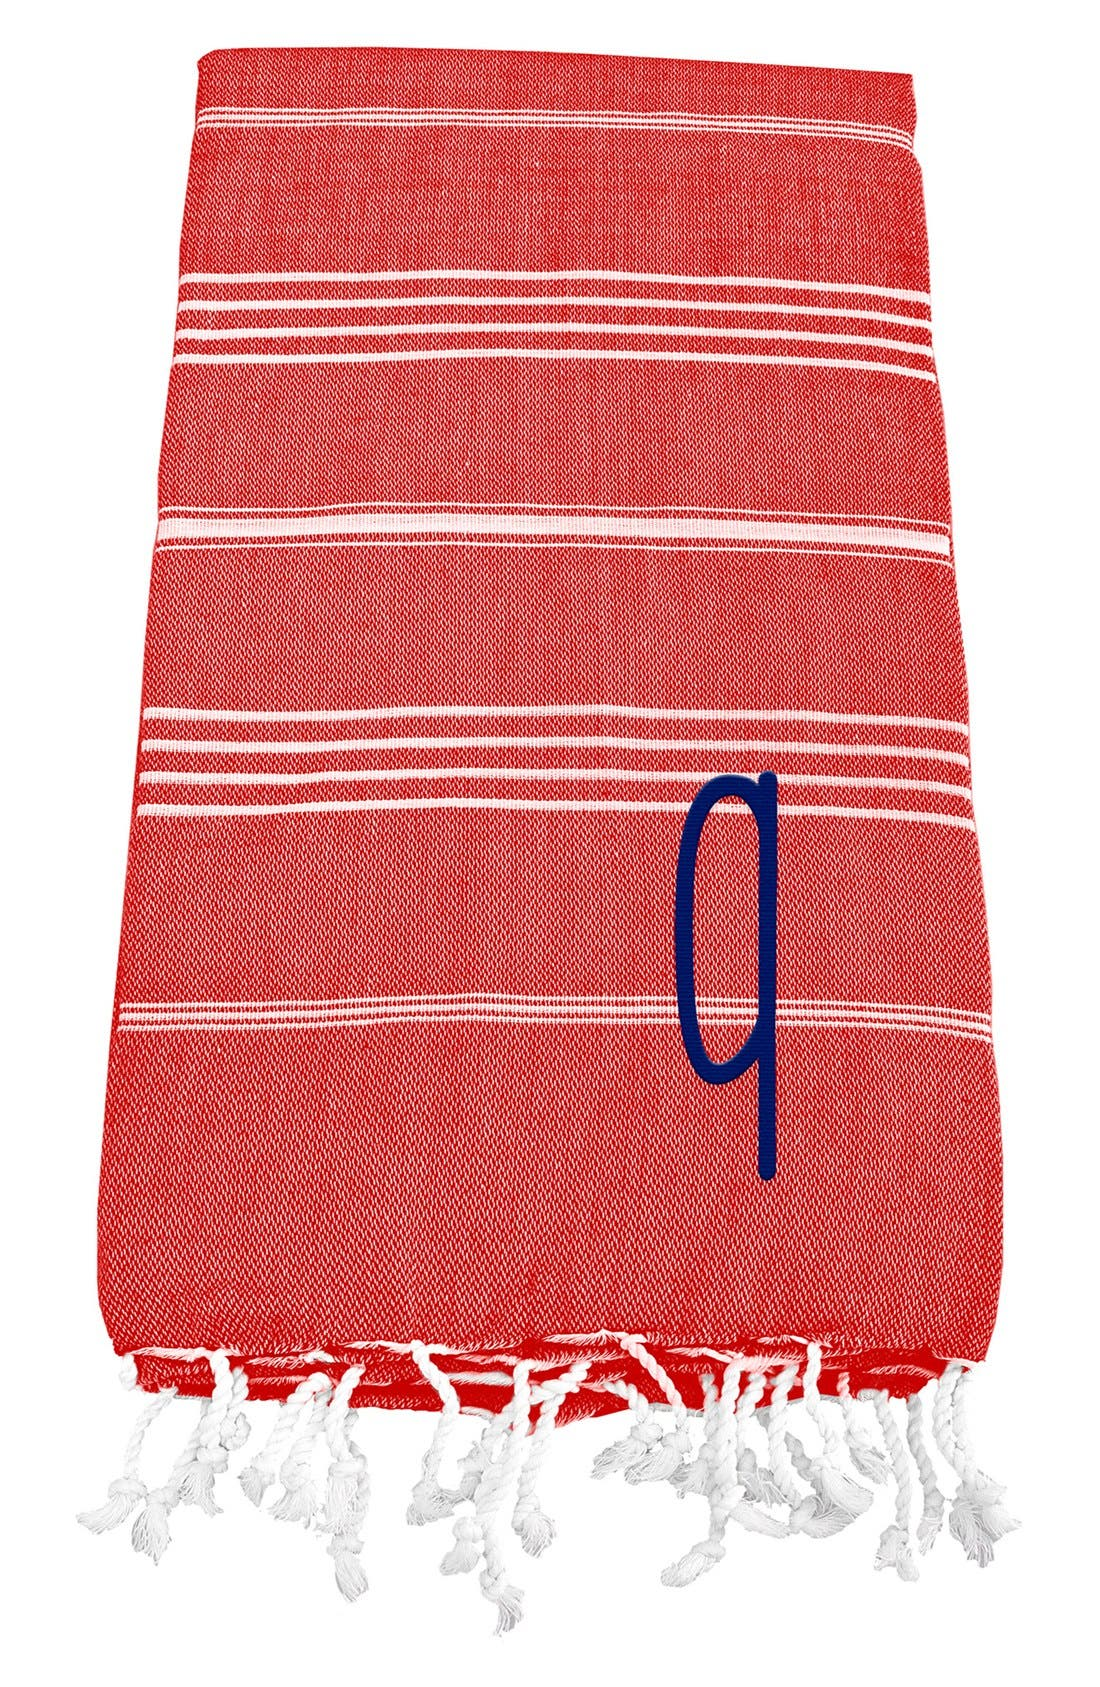 Monogram Turkish Cotton Towel,                             Main thumbnail 1, color,                             Red - Q